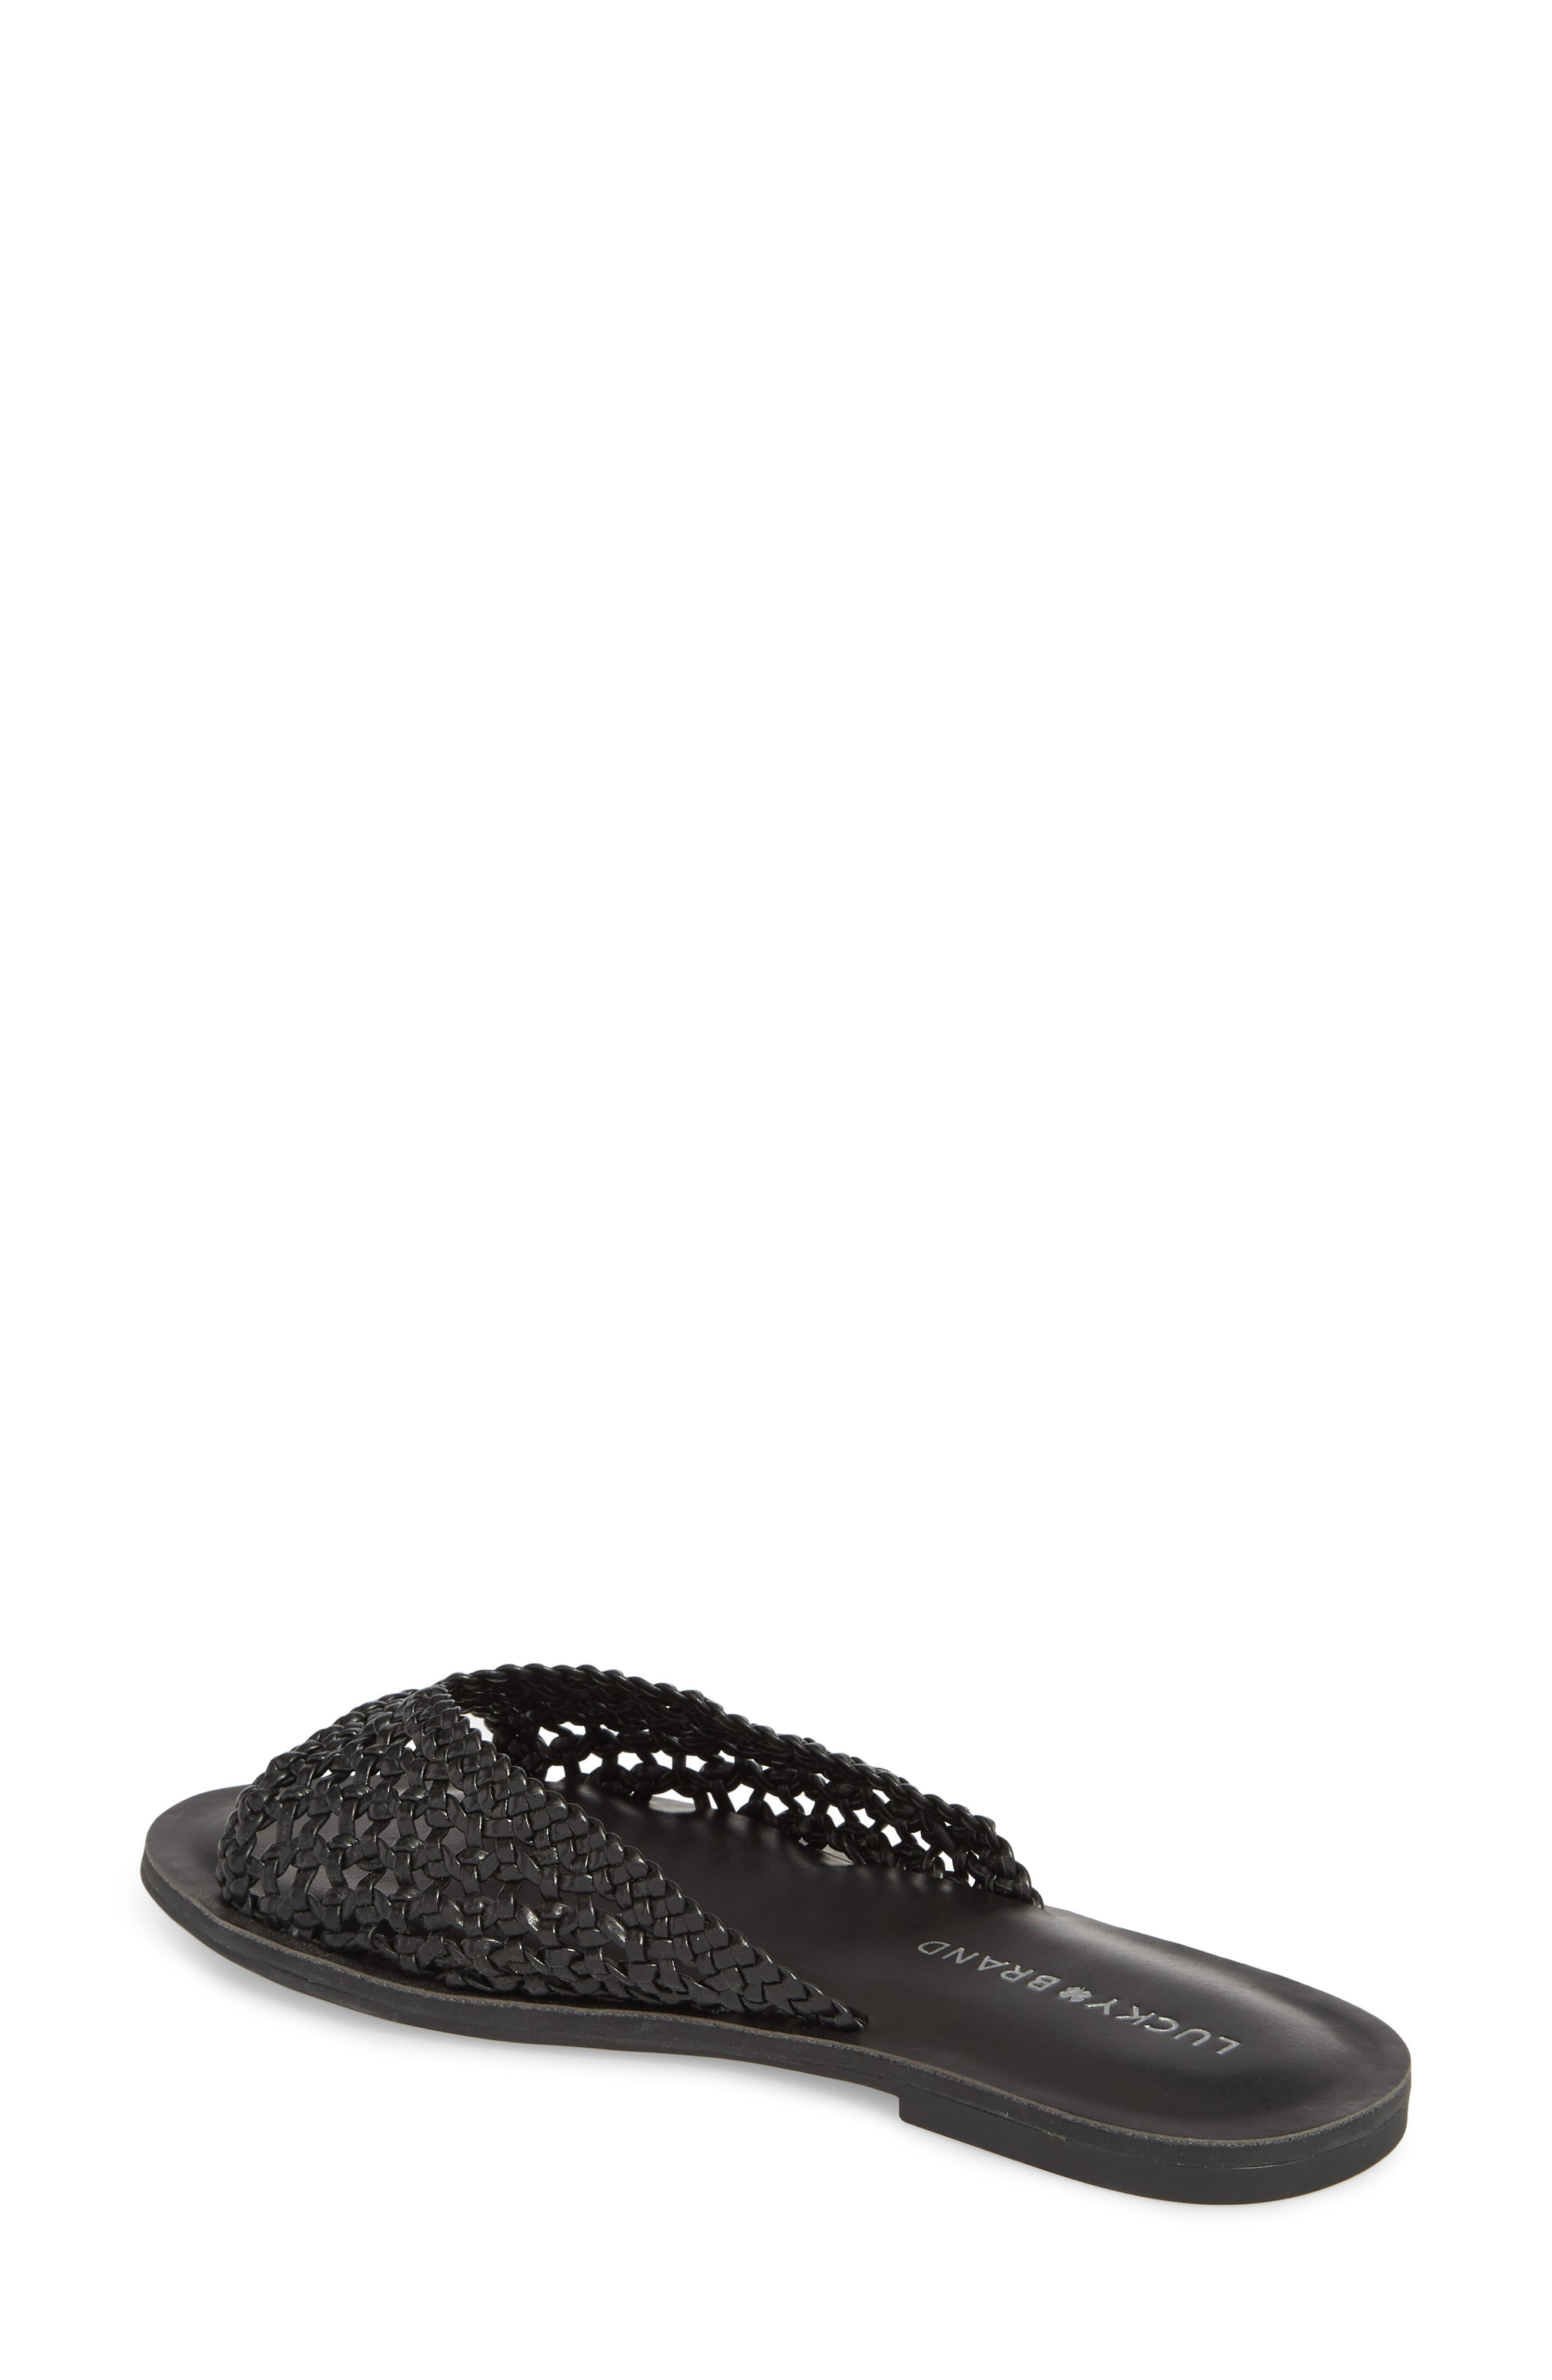 Adola Slide Sandal,                             Alternate thumbnail 2, color,                             Black Leather